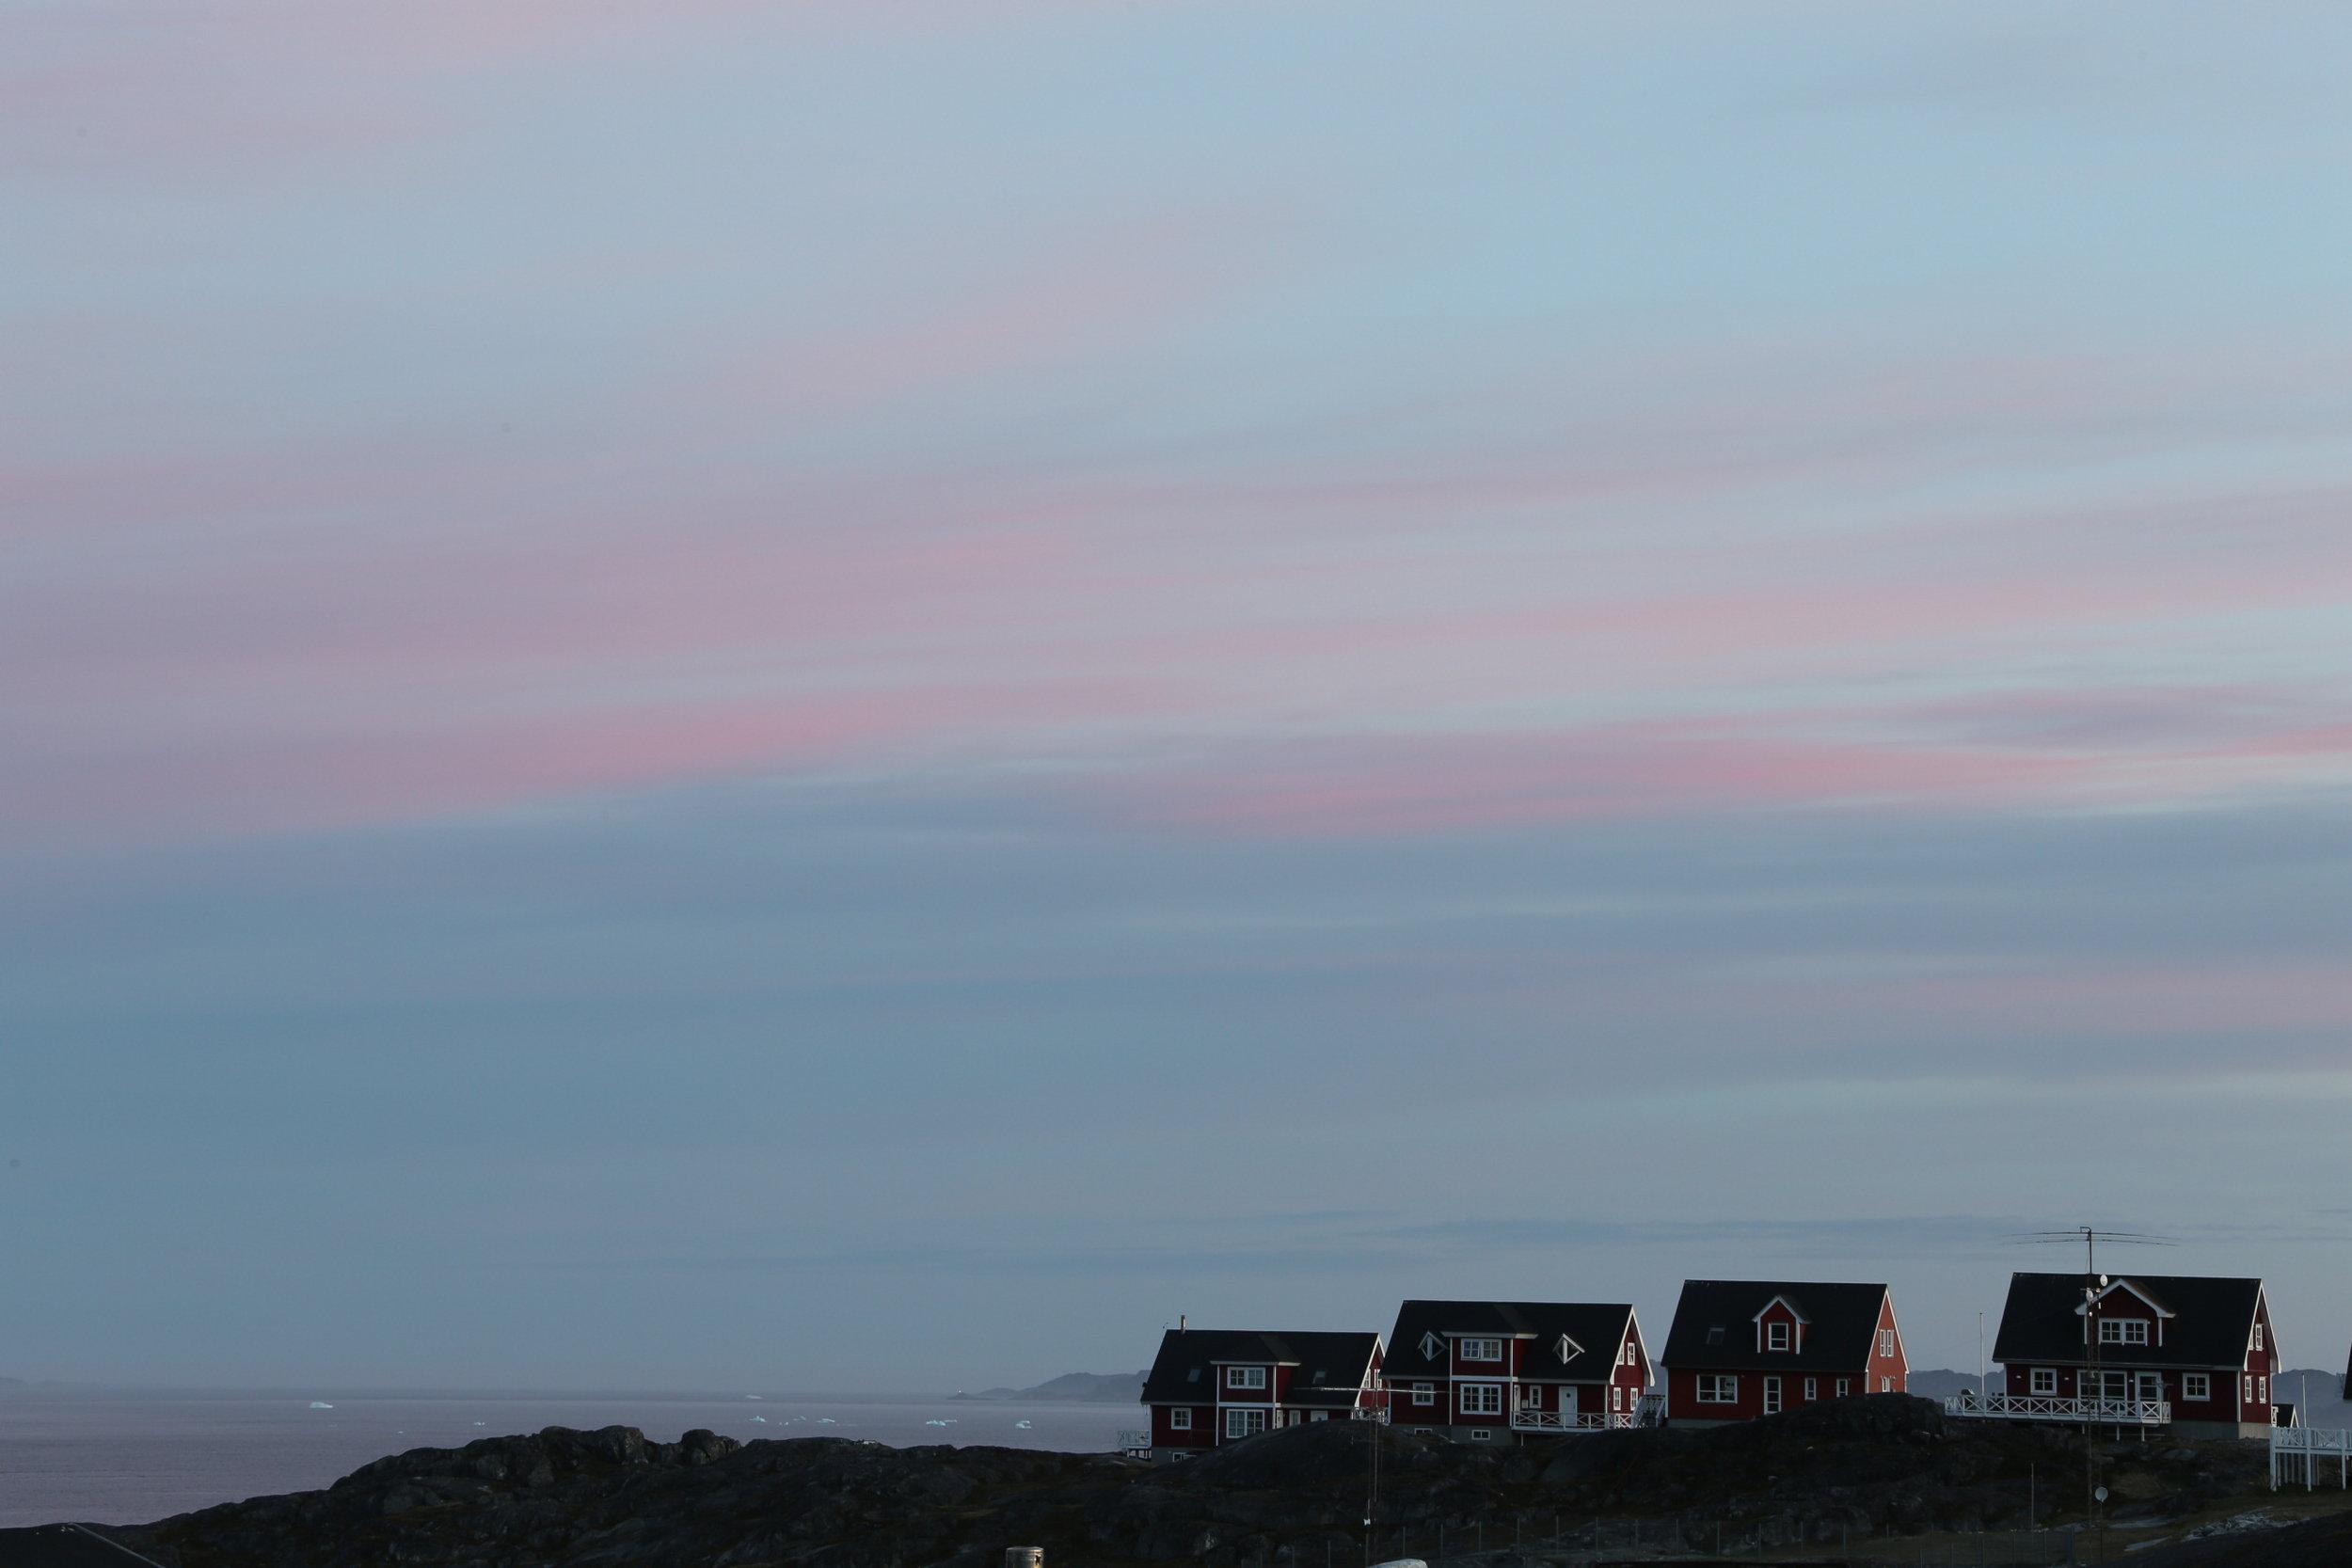 Sunset over Nuuk, Greenland.